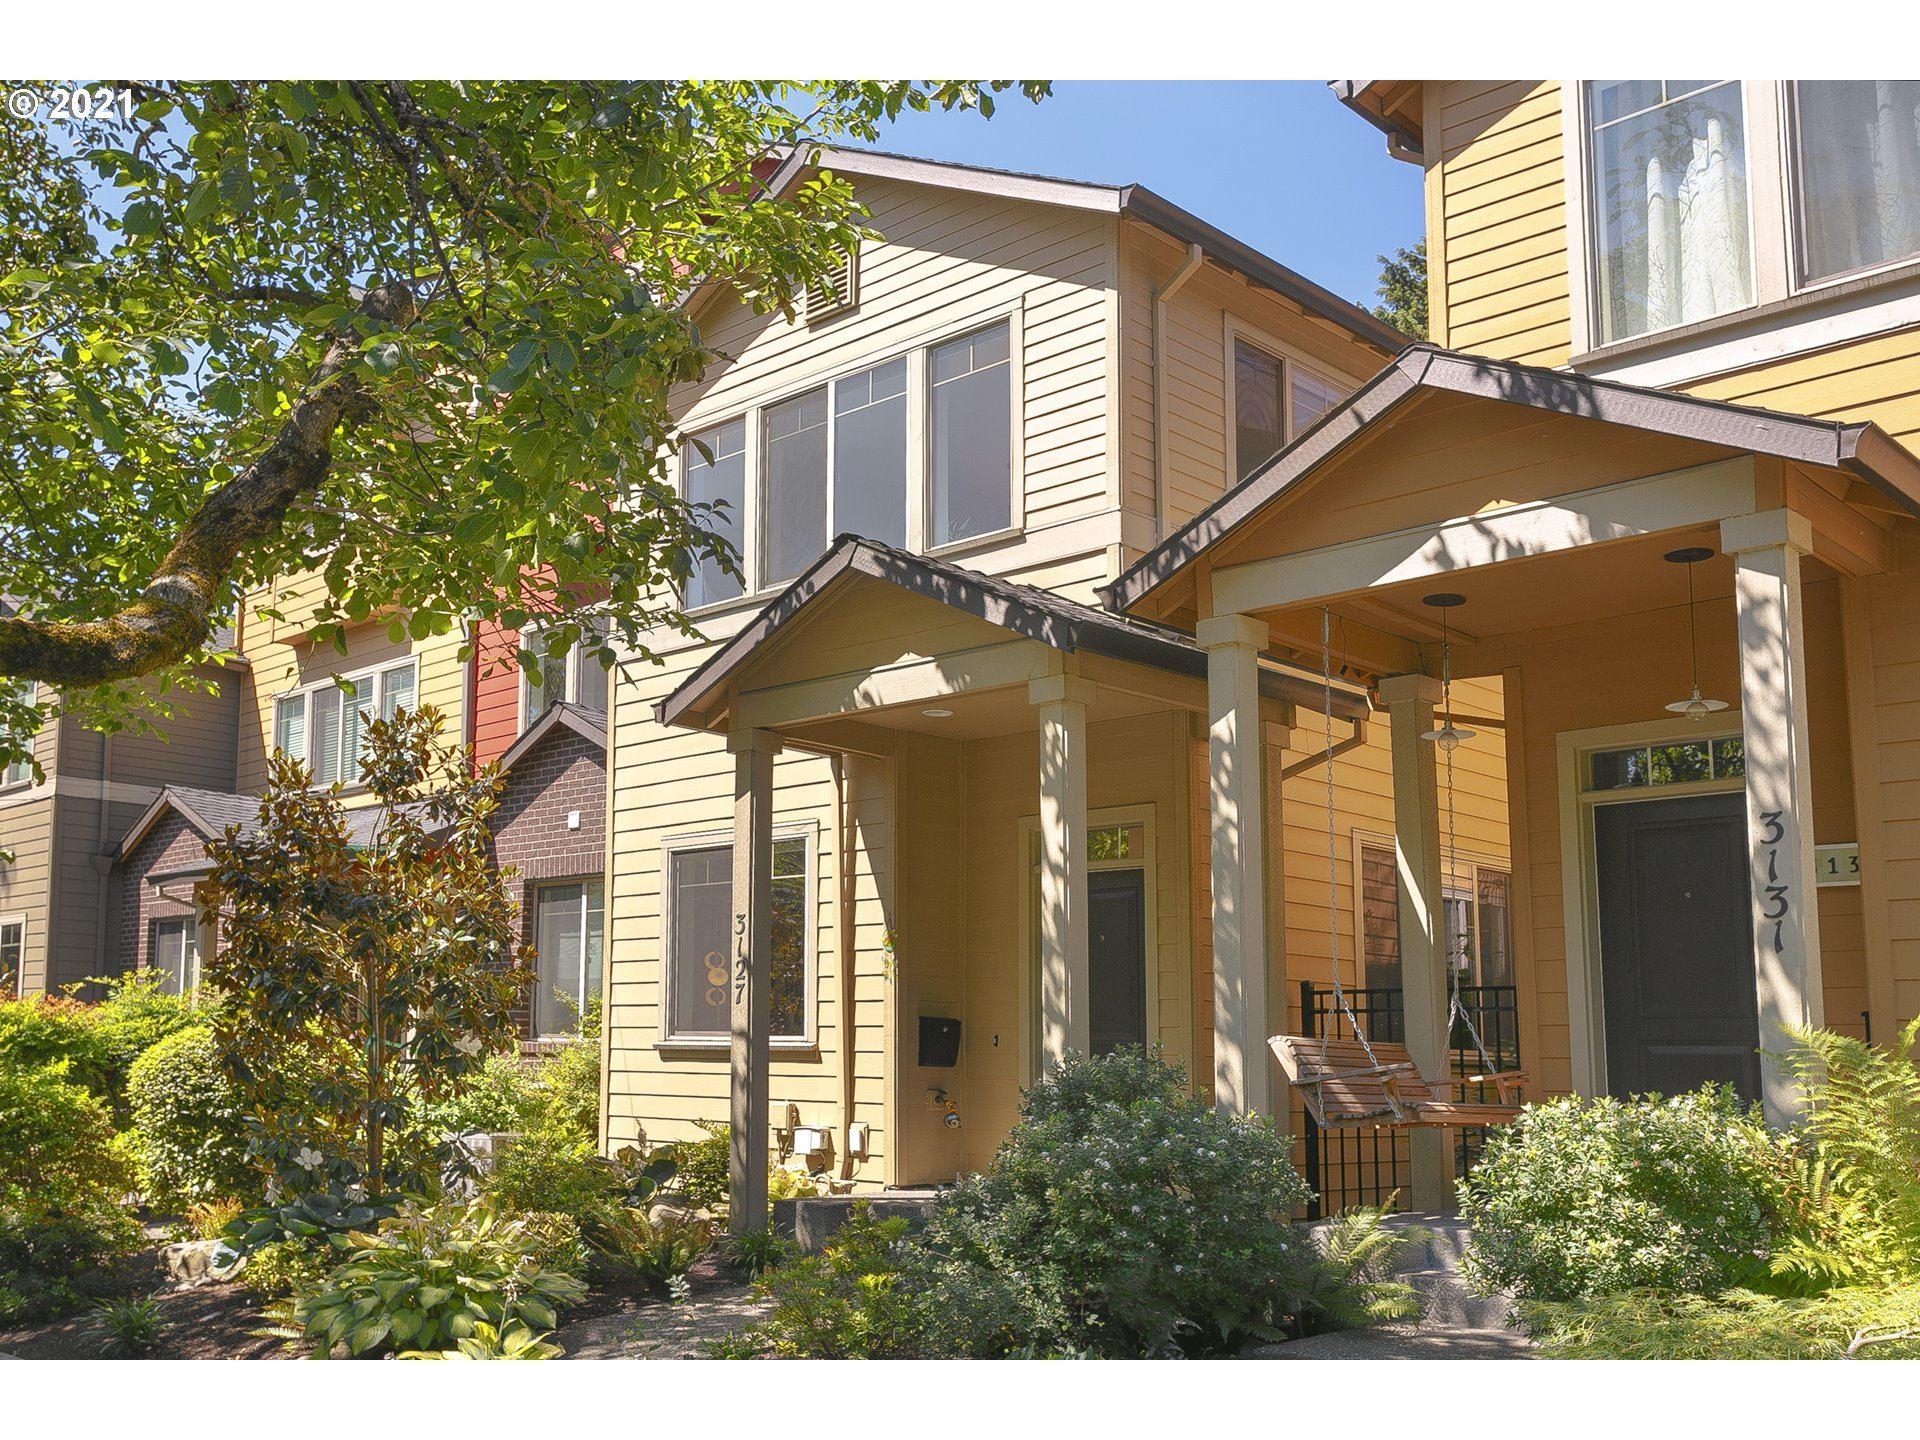 3127 NE 7TH AVE, Portland, OR 97212 - MLS#: 21491760